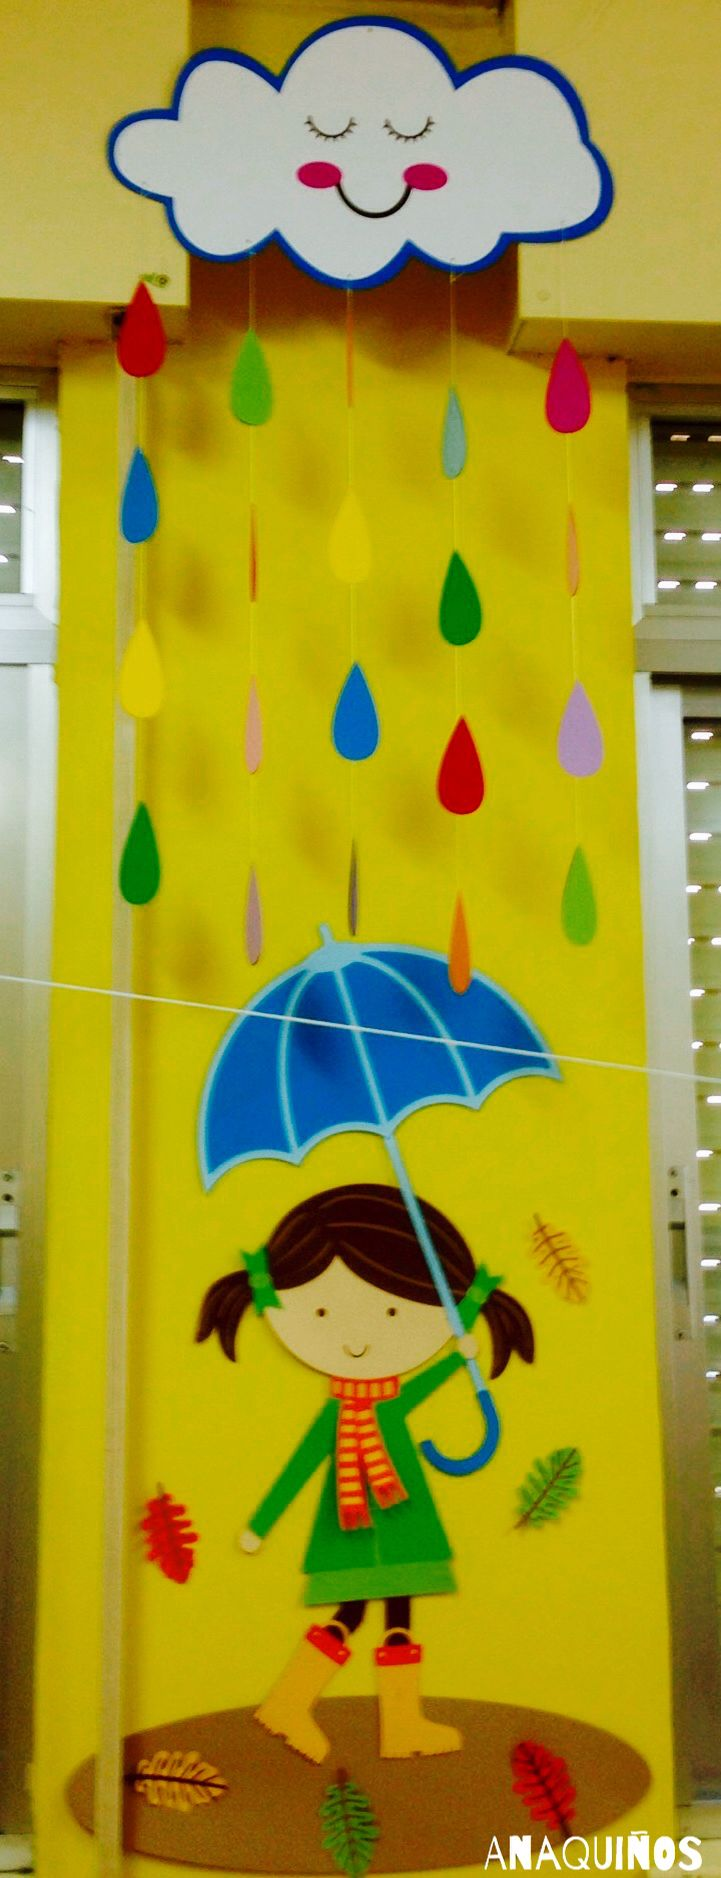 Llueve otoño